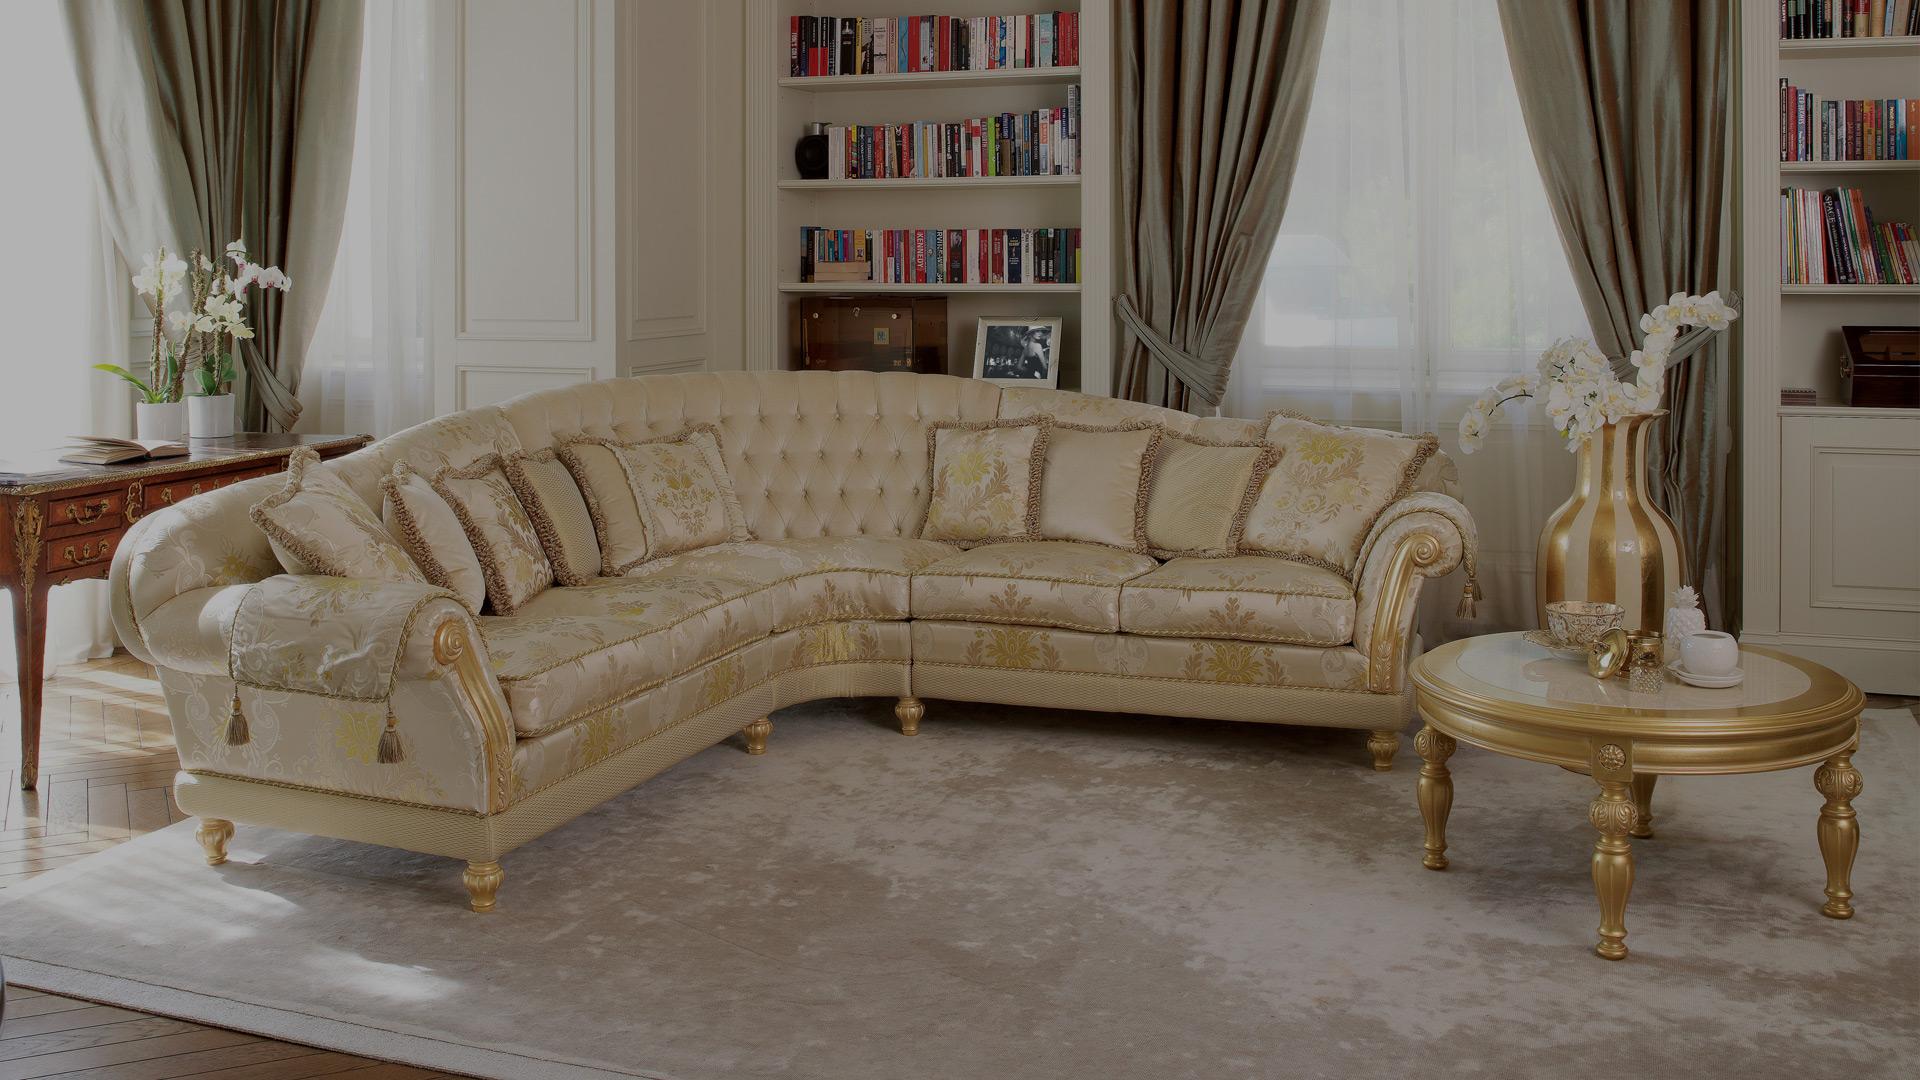 Divani Due Posti Stile Shabby : Divani classici eleganti fabulous divano bianco ad angolo